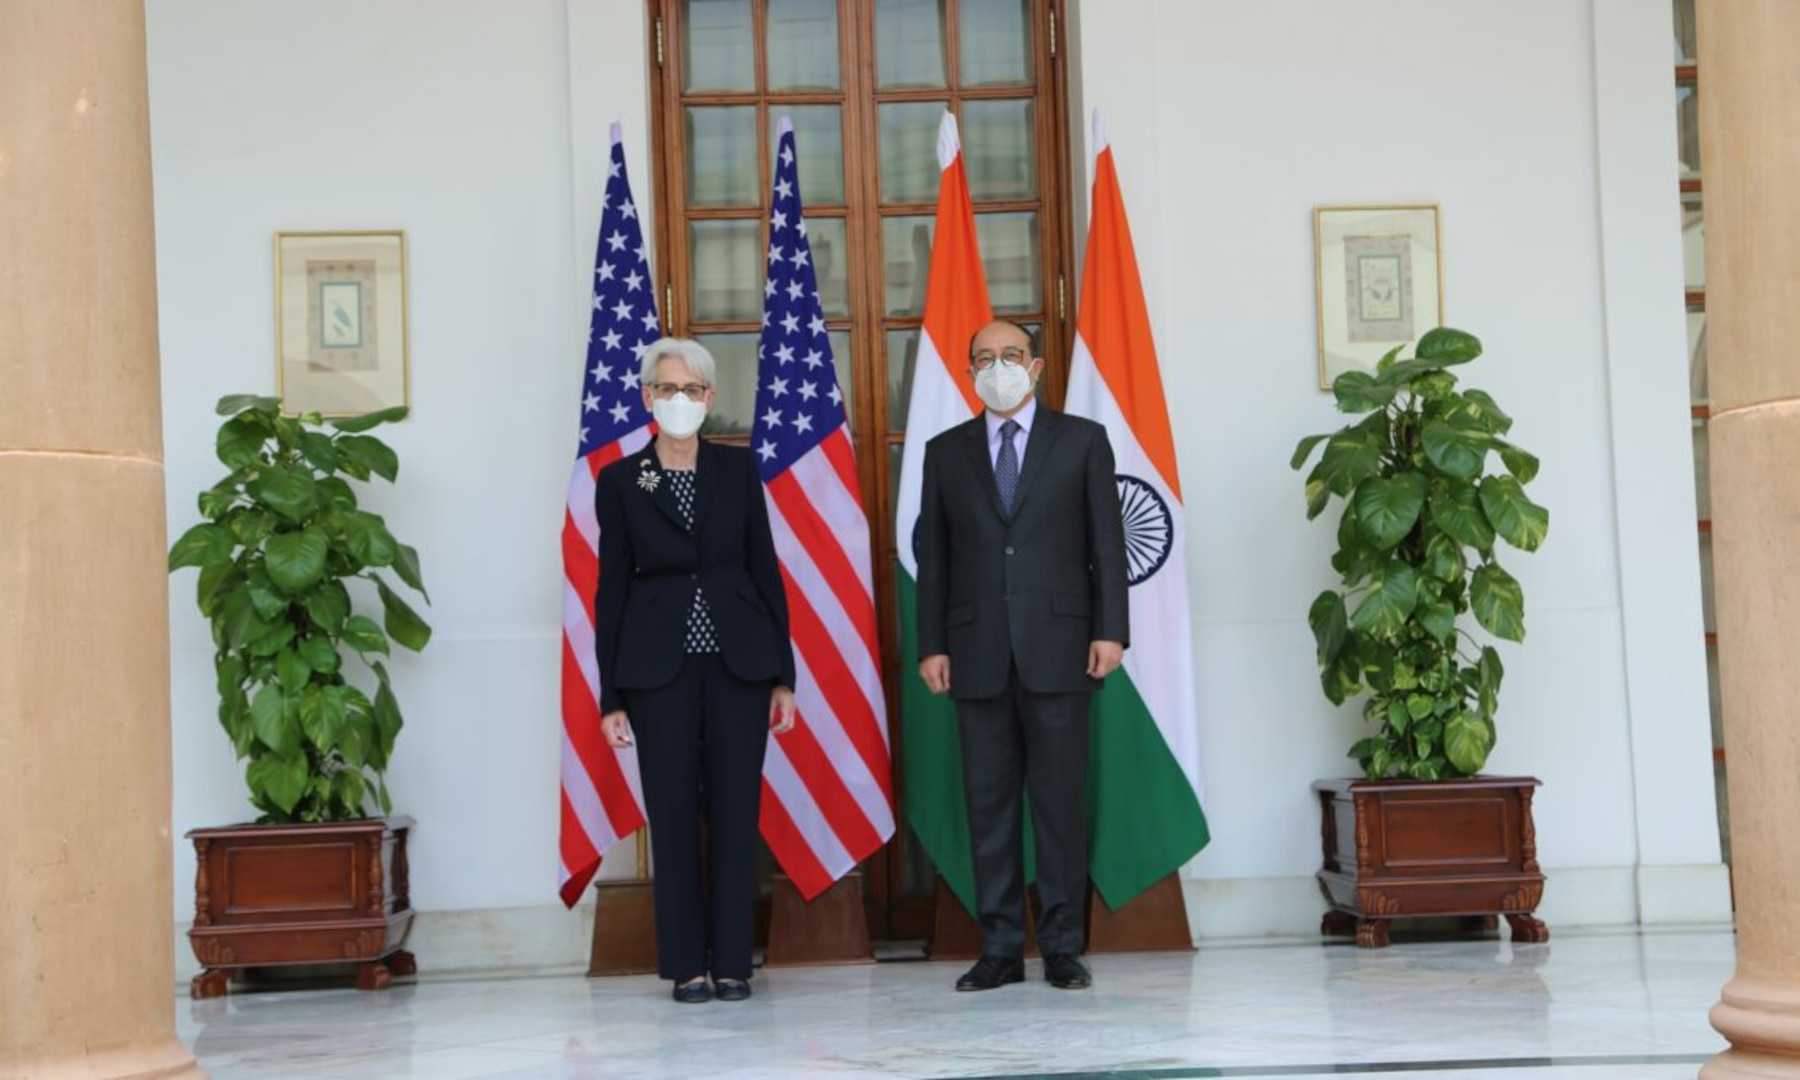 Meeting with Indian Foreign Secretary Harsh Shringla